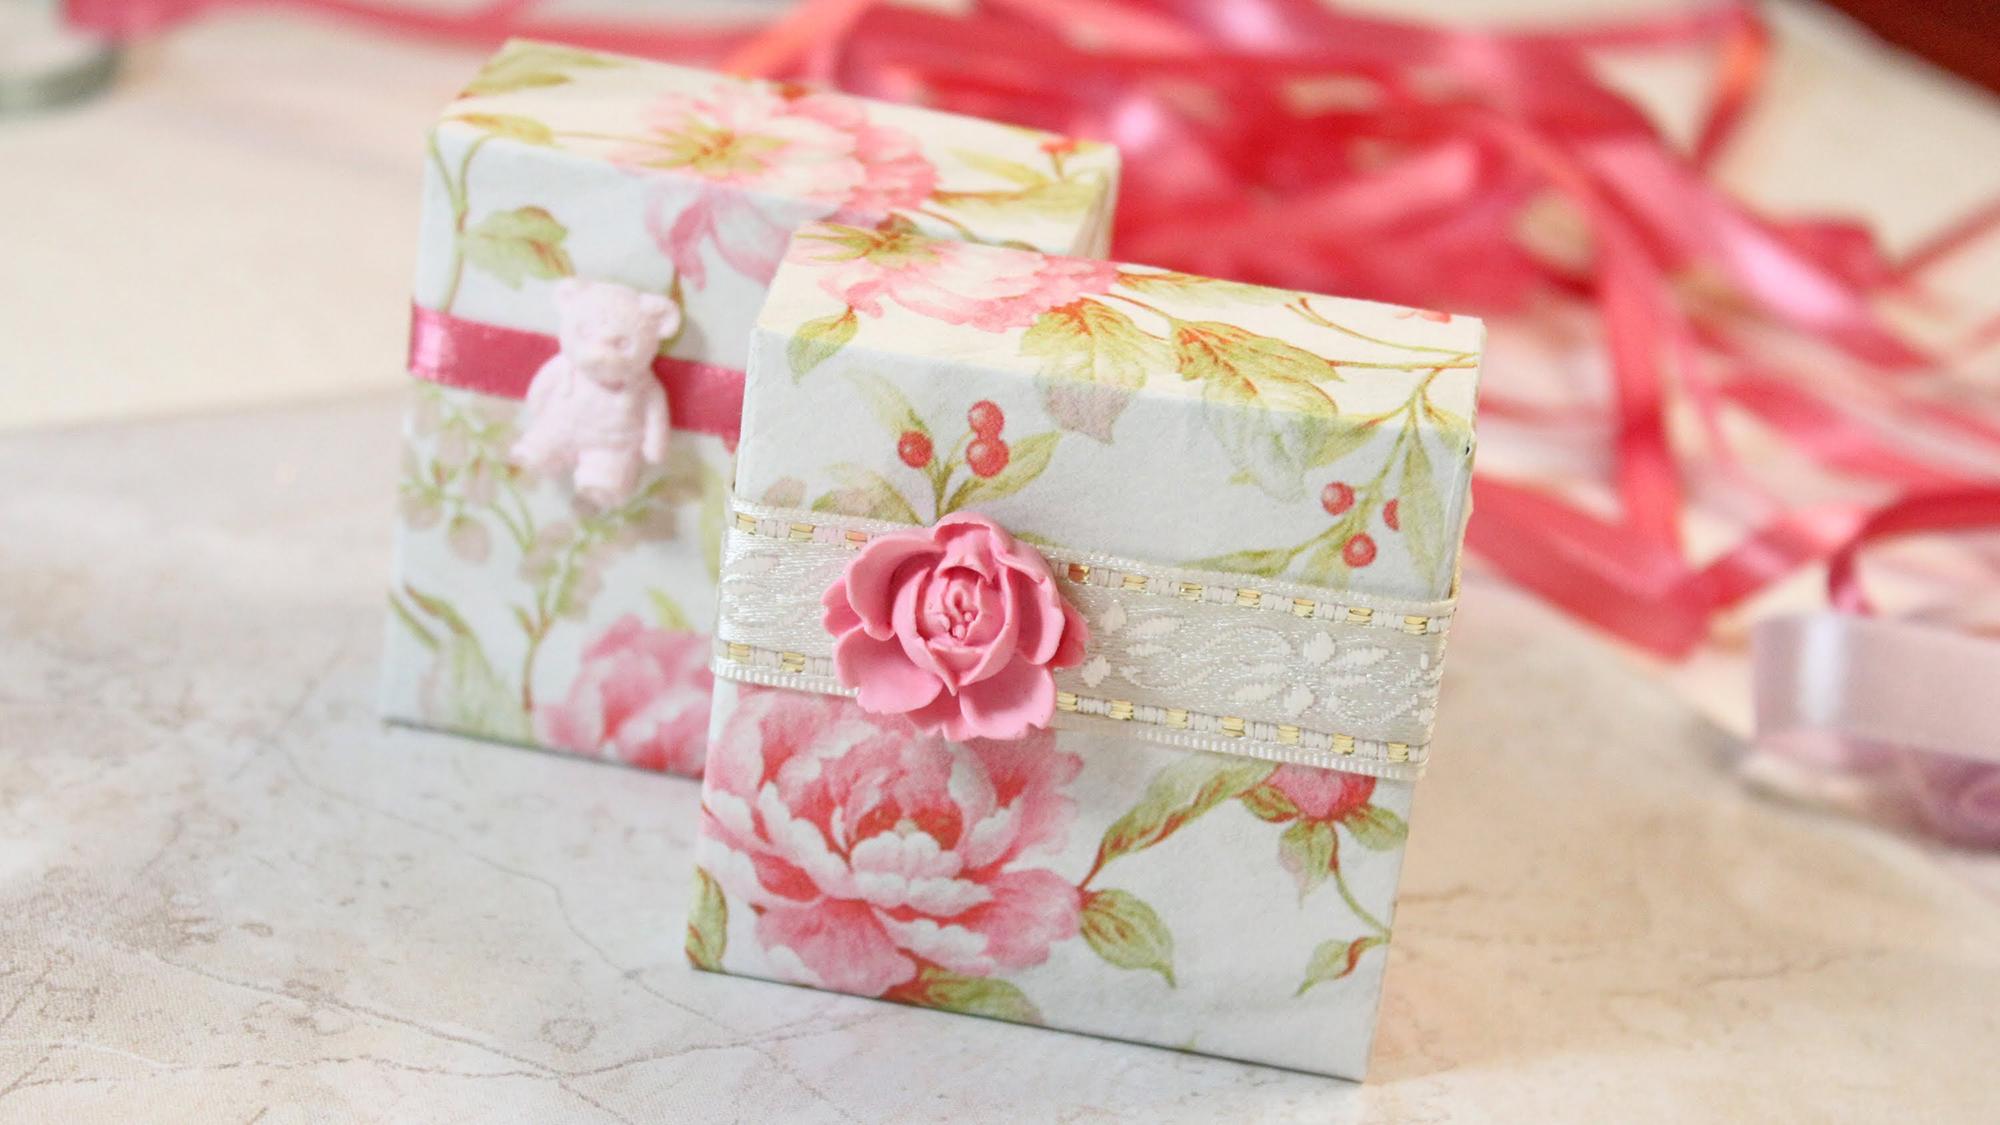 Как красиво украсить коробку своими руками